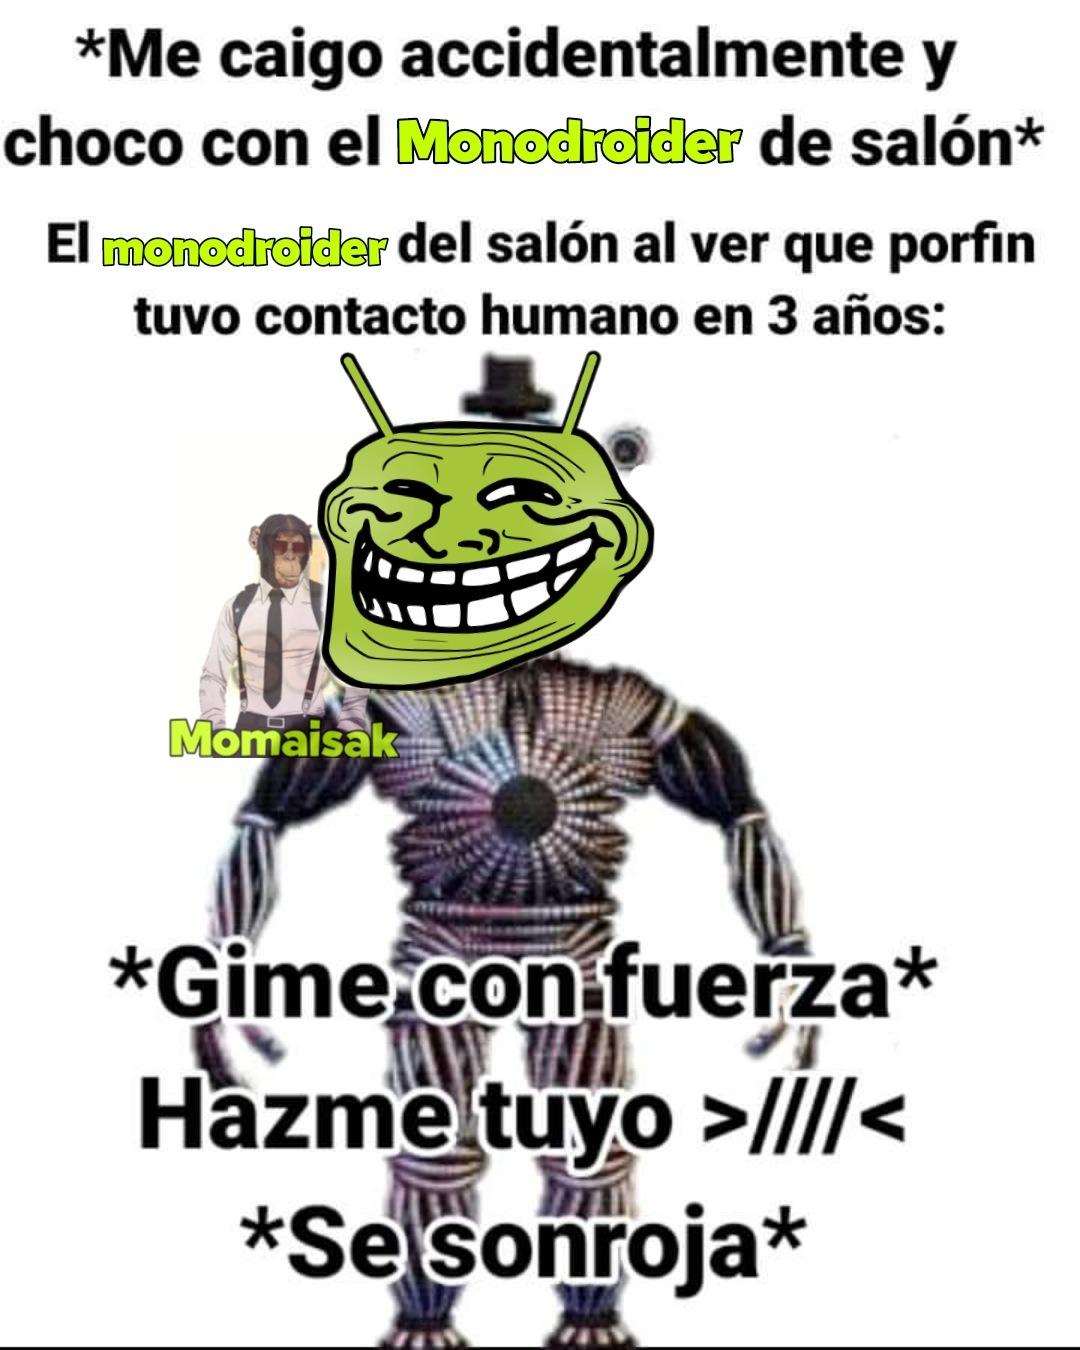 When humillas a gran torlino - meme